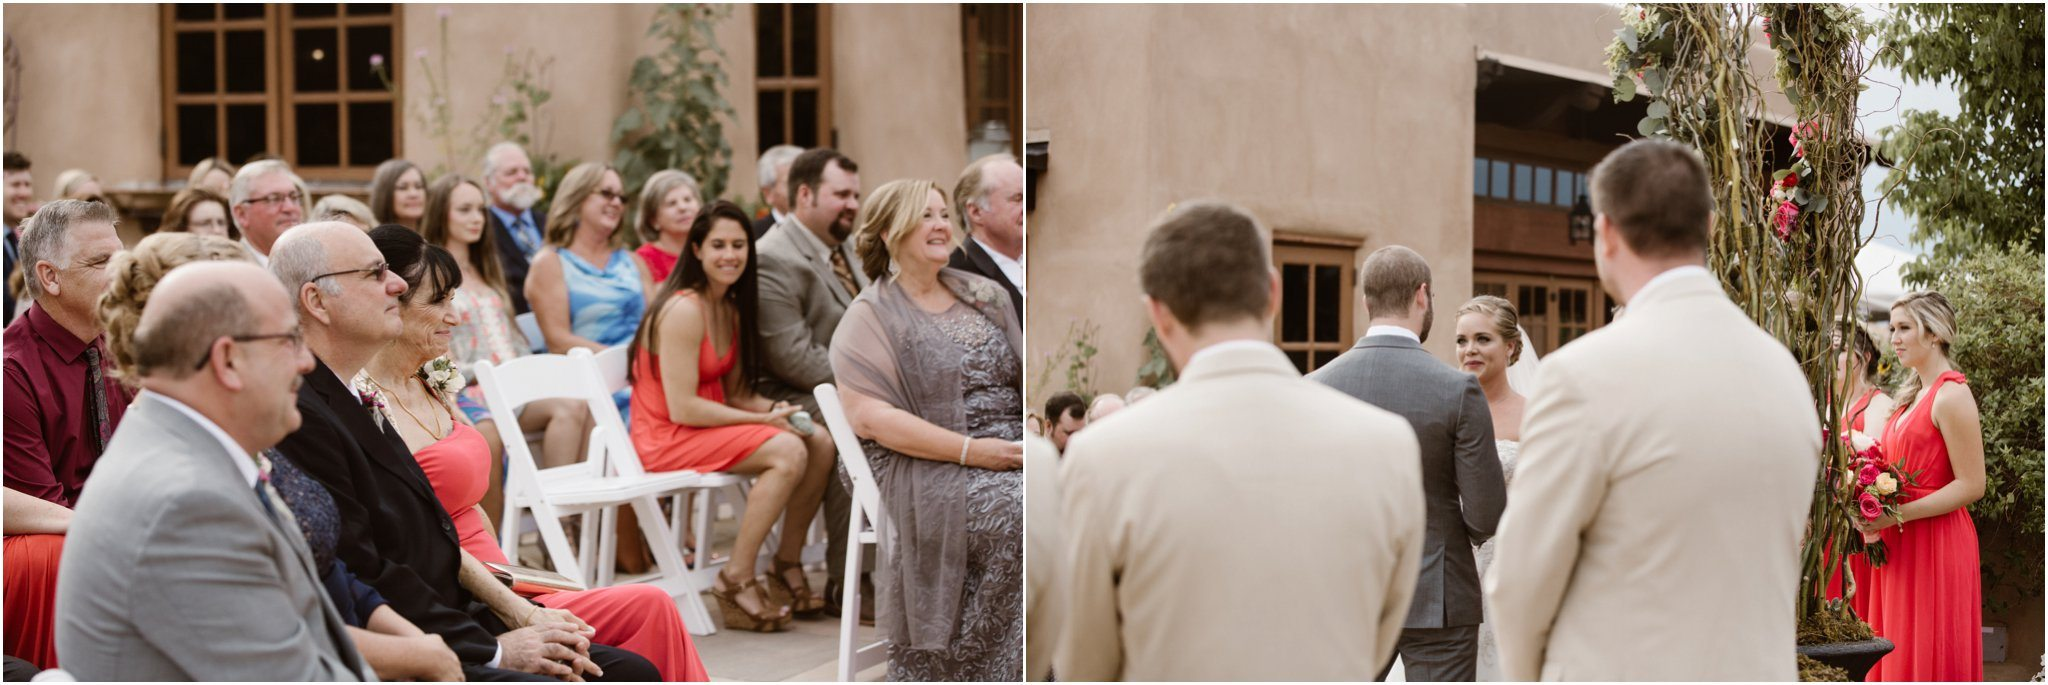 0042albuquerque-wedding-photographer_-santa-fe-wedding-photographer_-southwest-wedding-photography_-blue-rose-studio